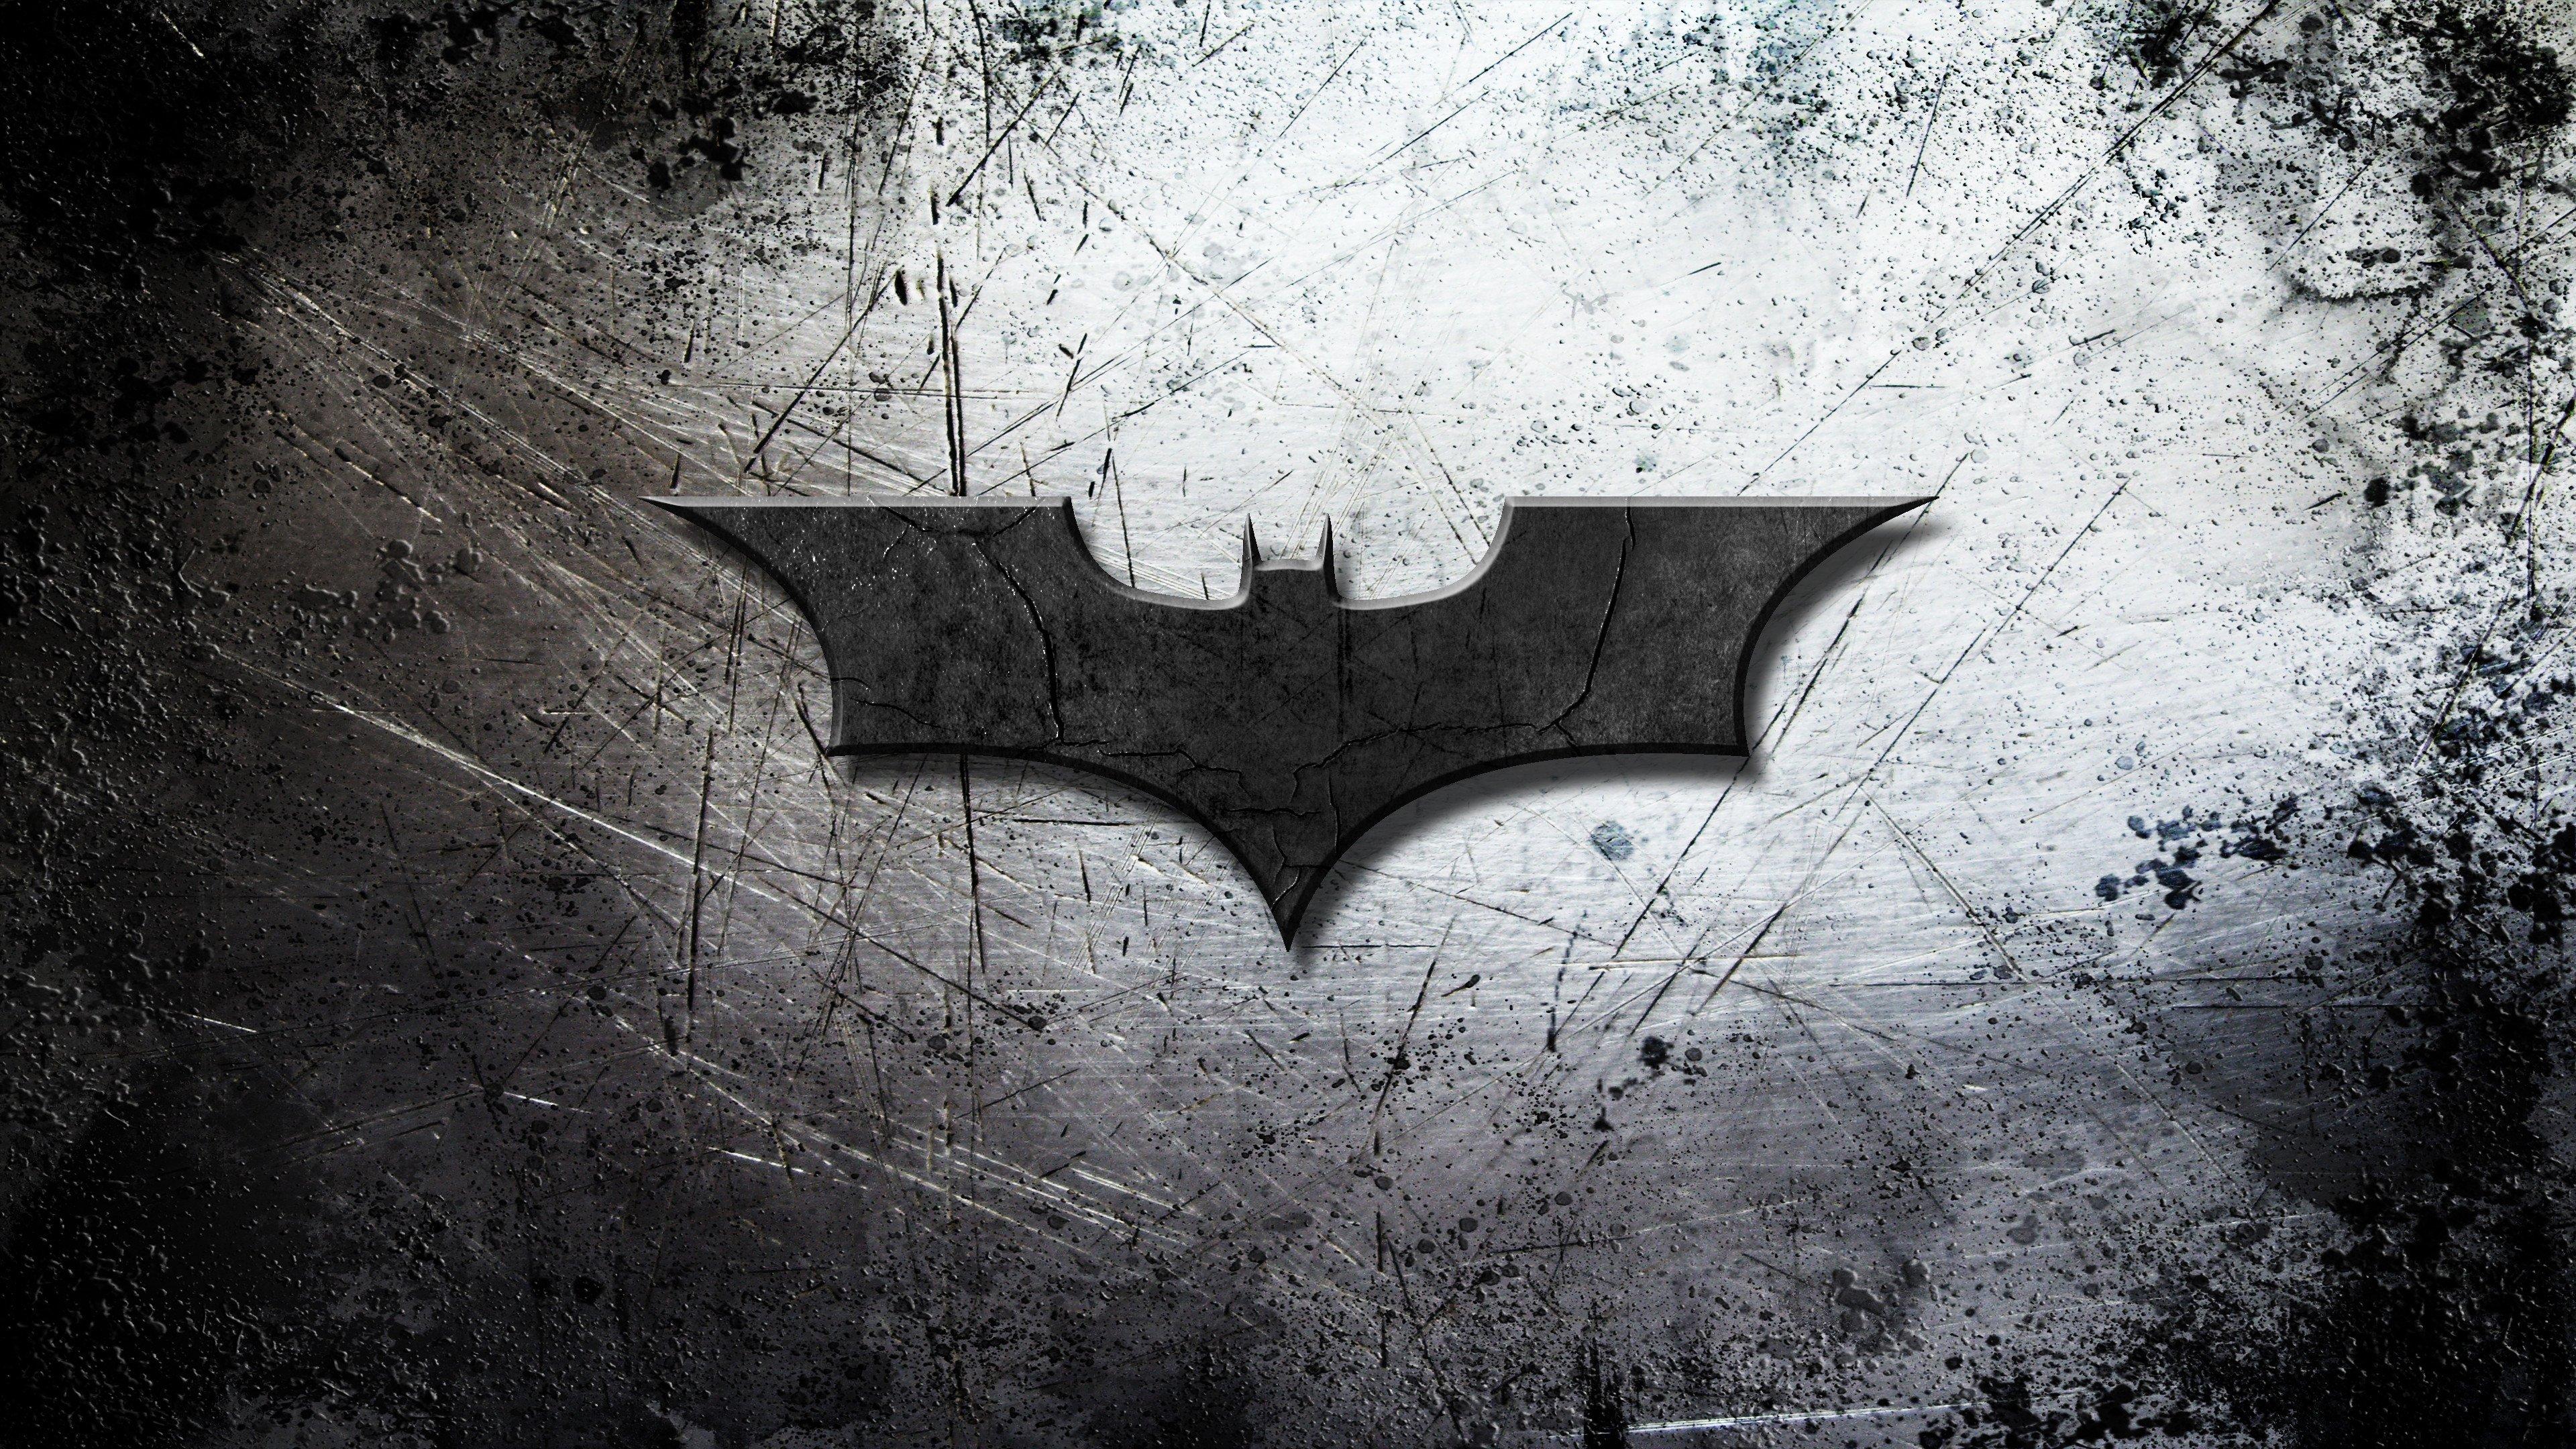 4k Batman Background Texture Wallpaper Wide Screen Wallpaper 1080p 3840x2160